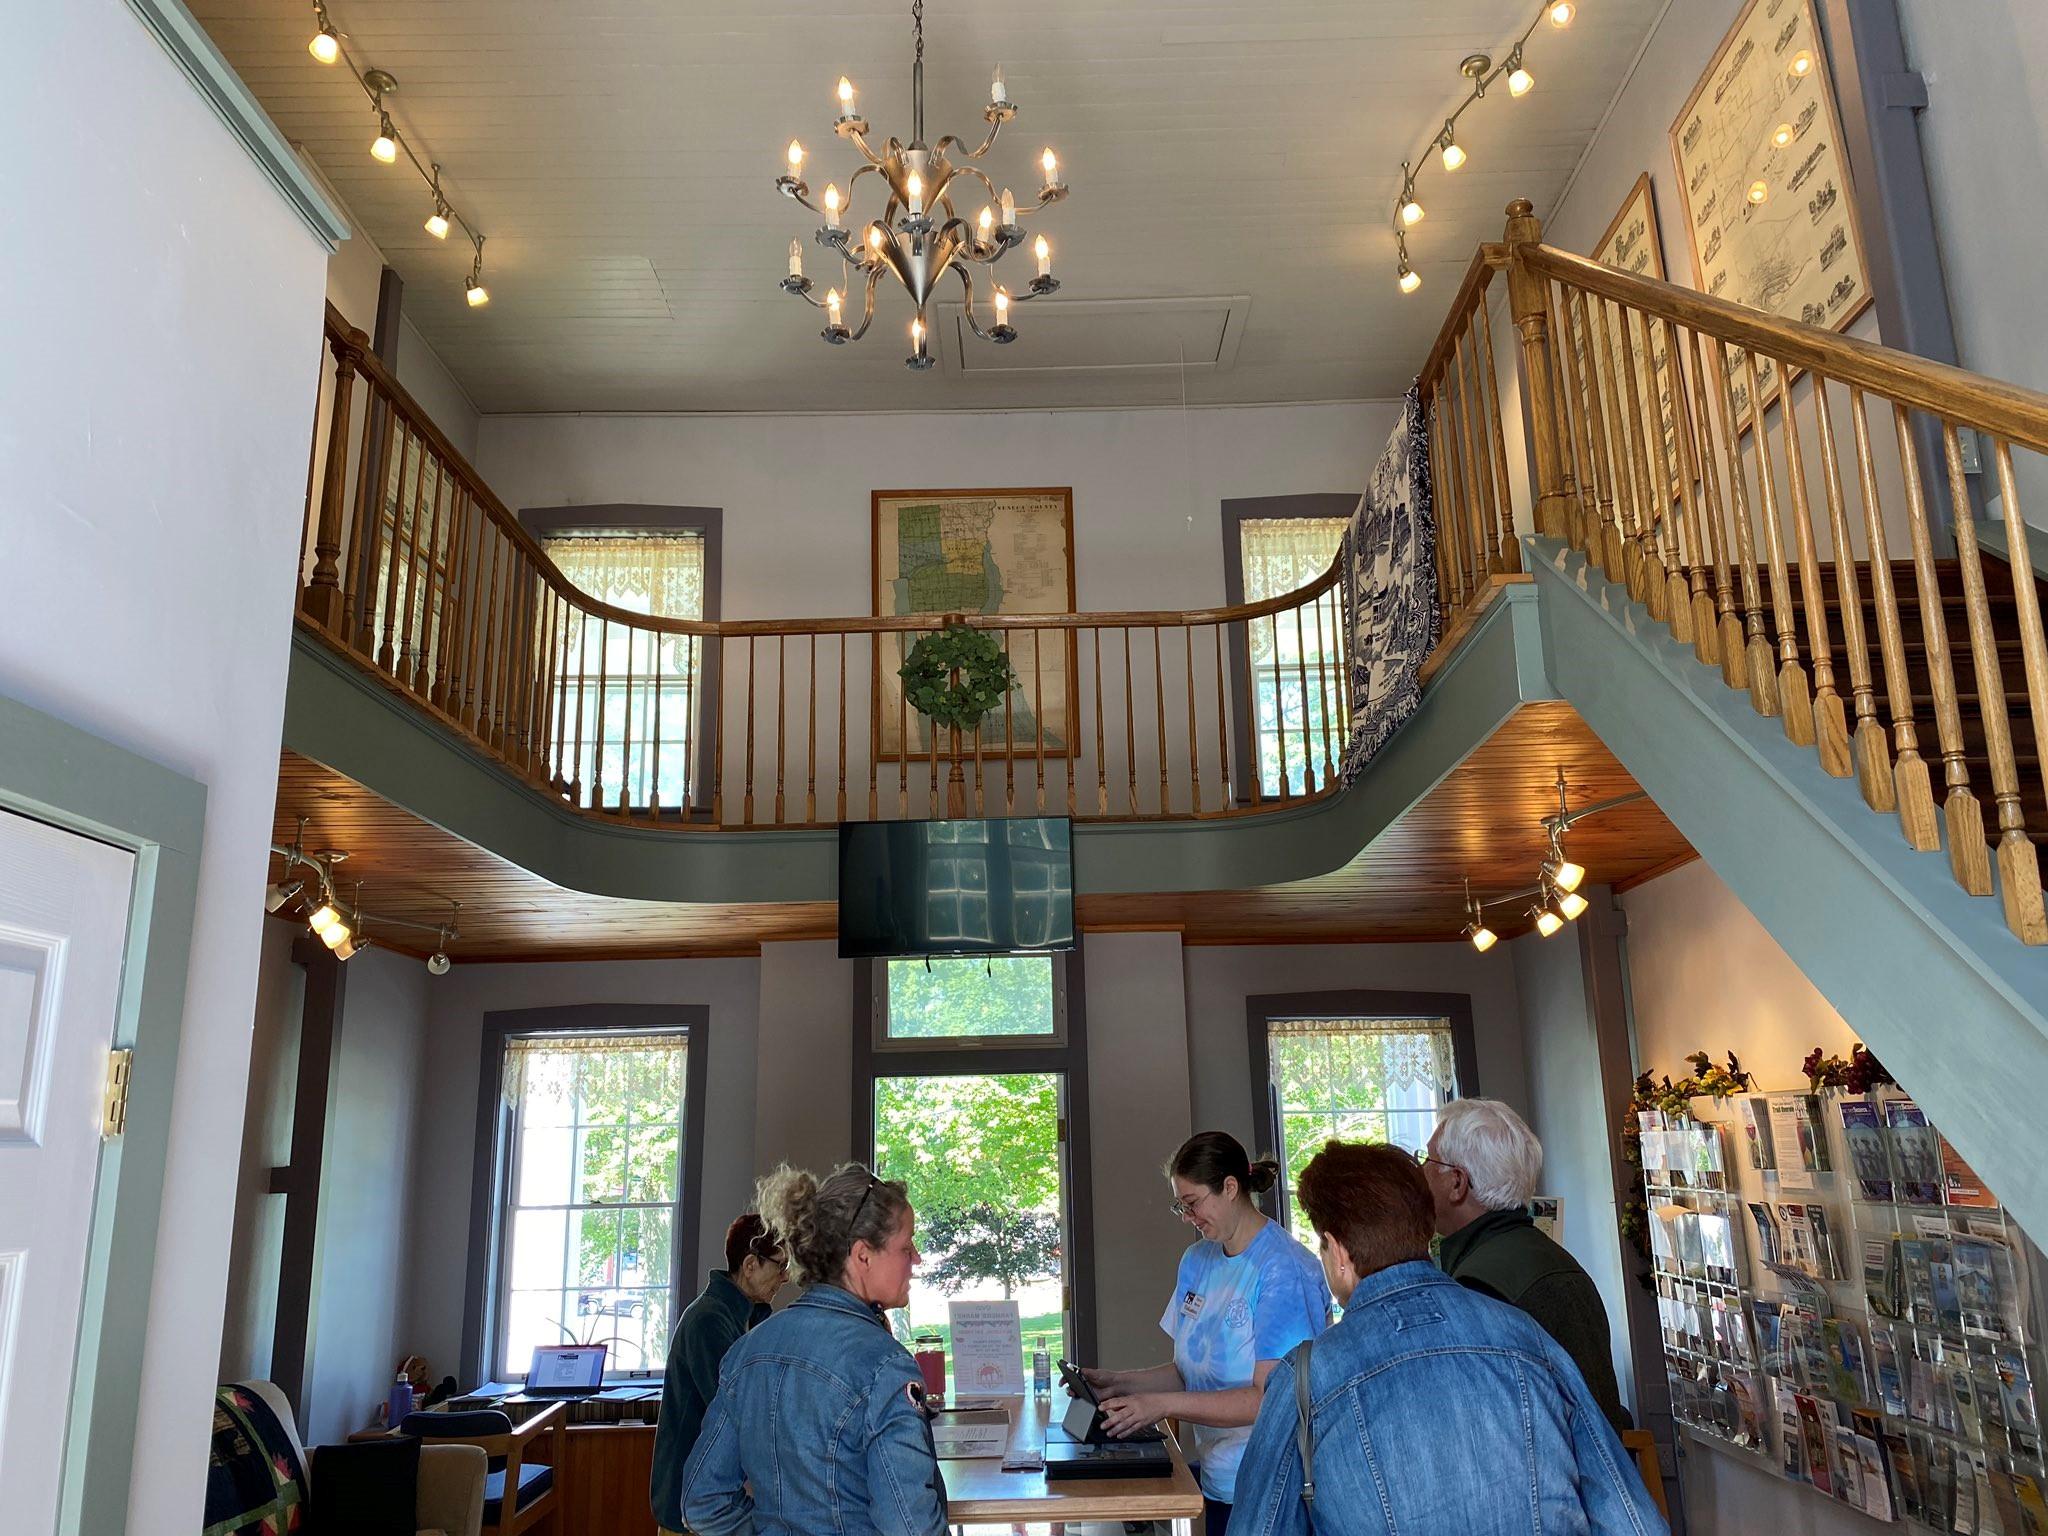 Mama Bear serves as historic landmark, tour guide for Seneca County's histo